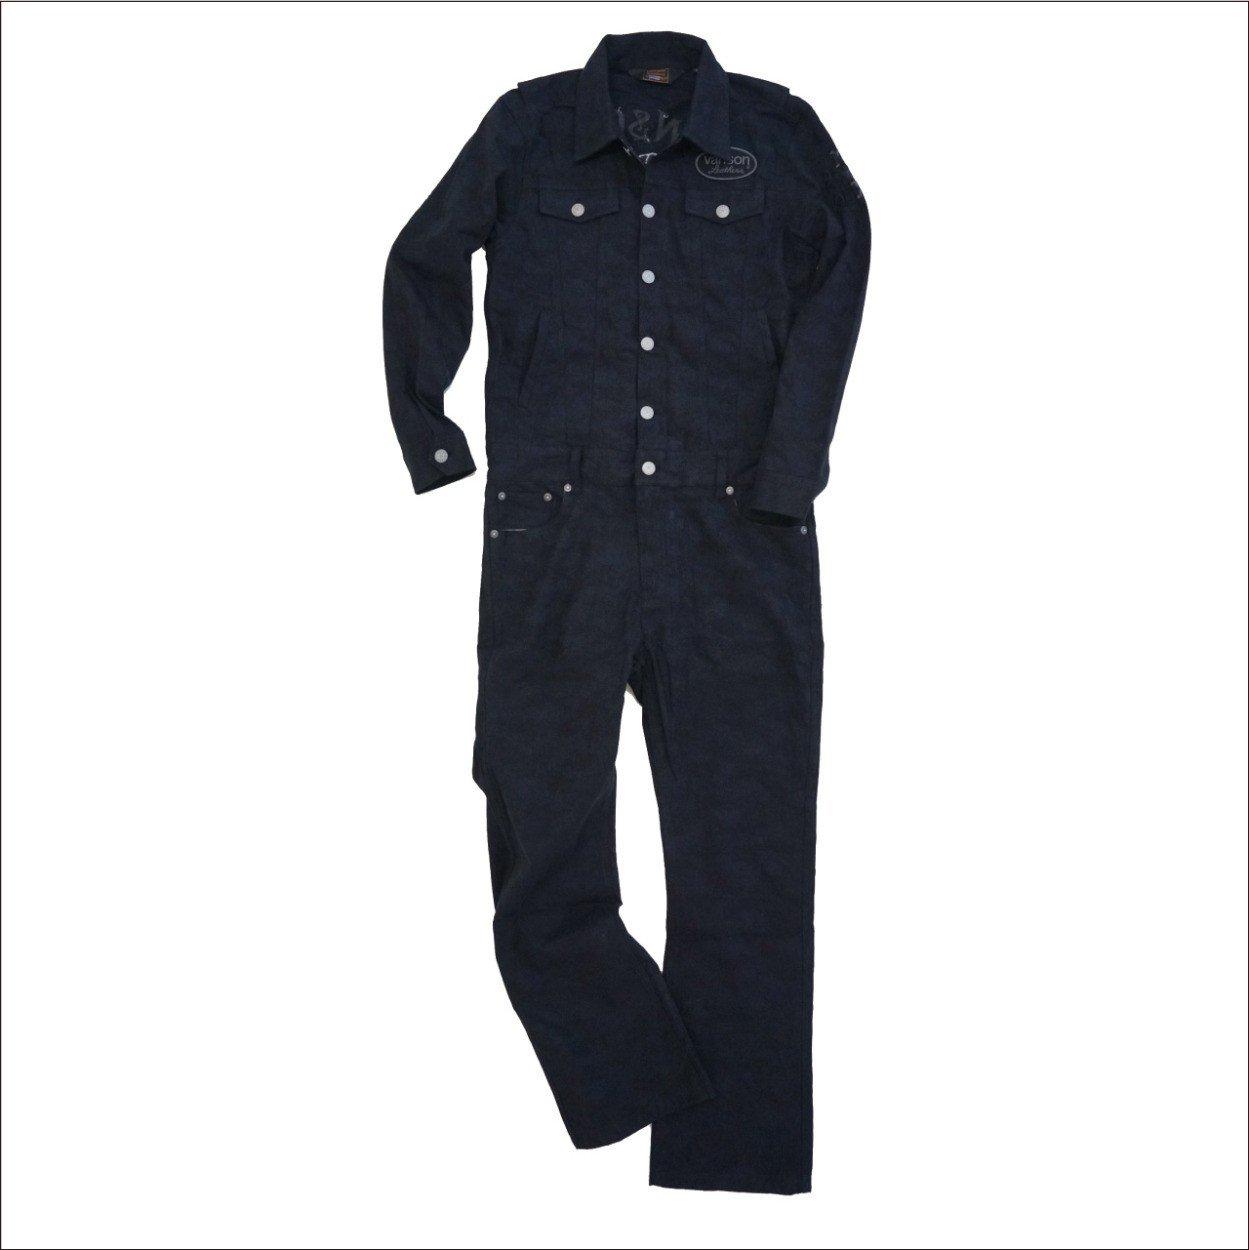 VANSON バンソン つなぎ オールインワン 刺繍 ワッペン NVAO-503 B014W2YH64 L|ブラックカモフラージュ ブラックカモフラージュ L